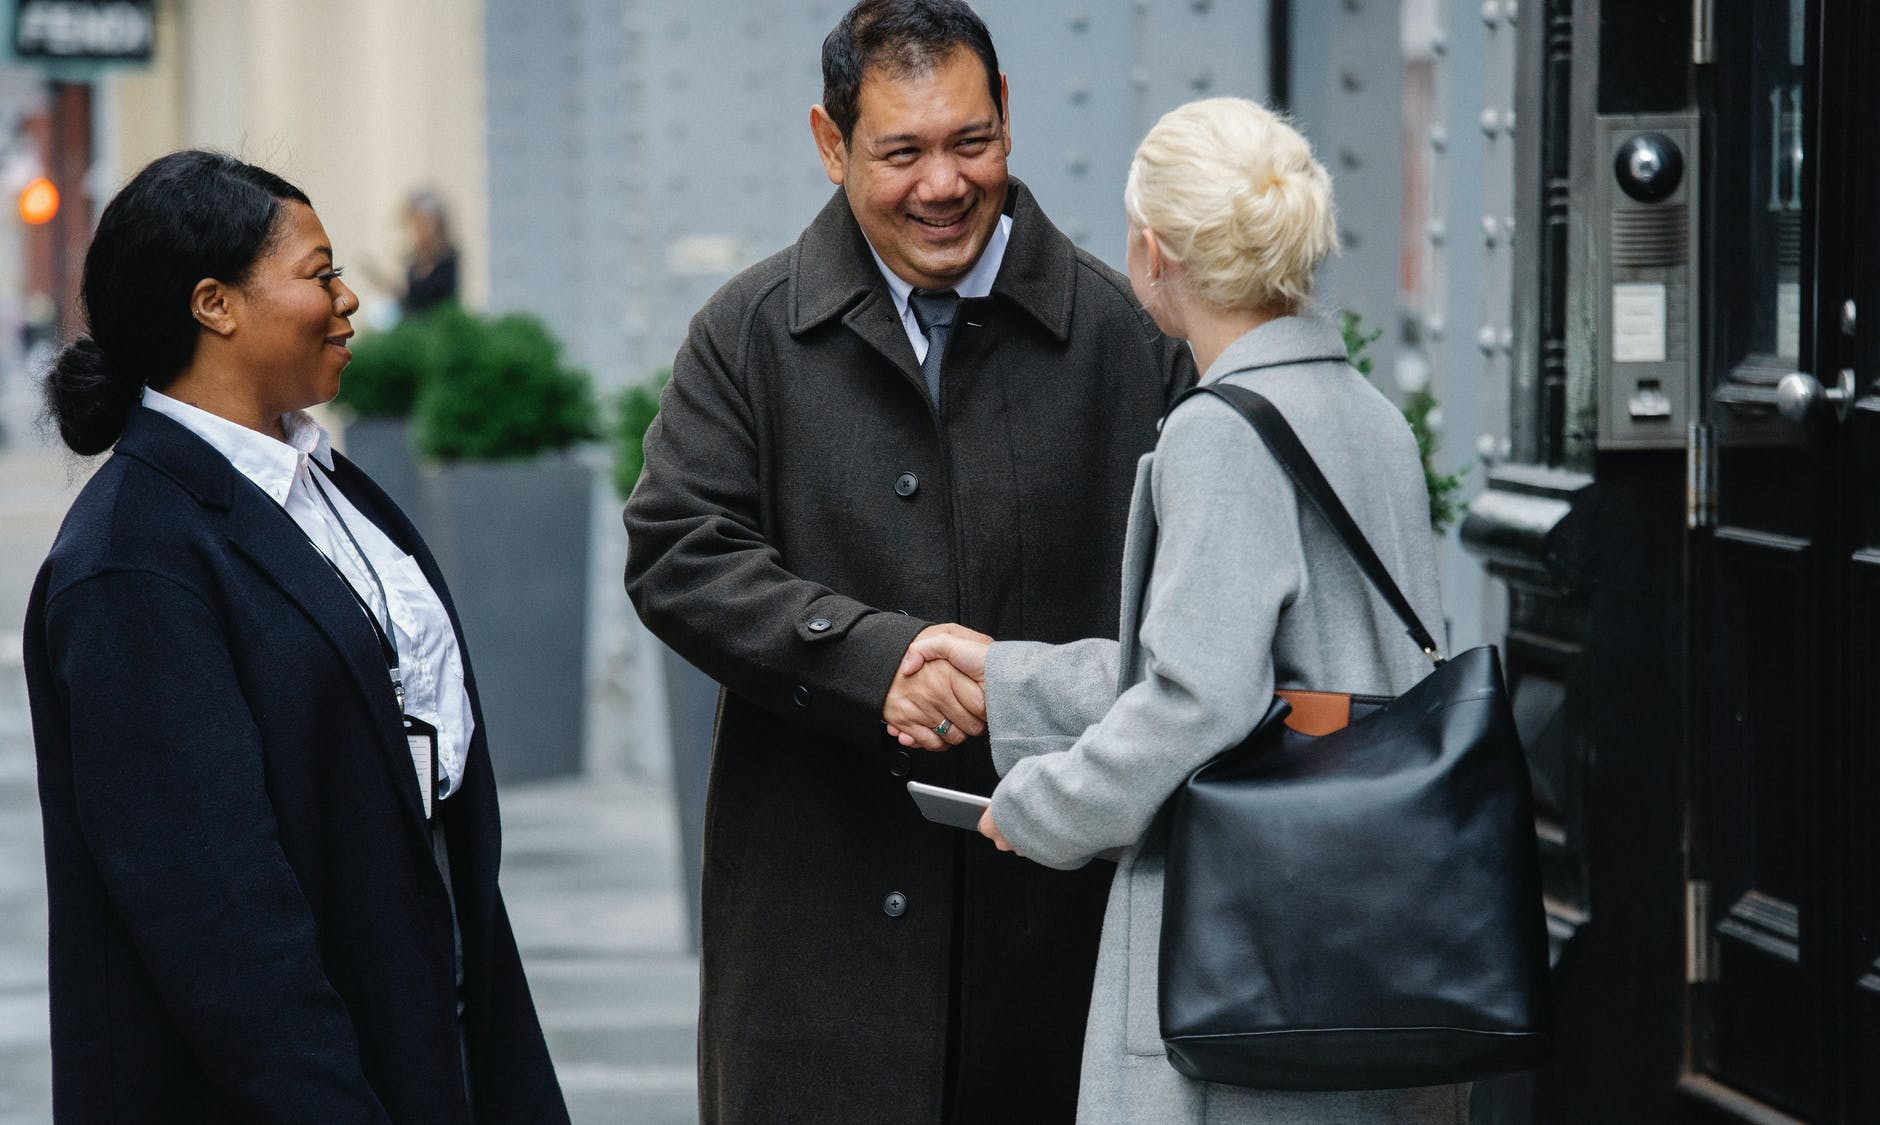 Photo of man Immigrant Investor - seeking EB-5 green card